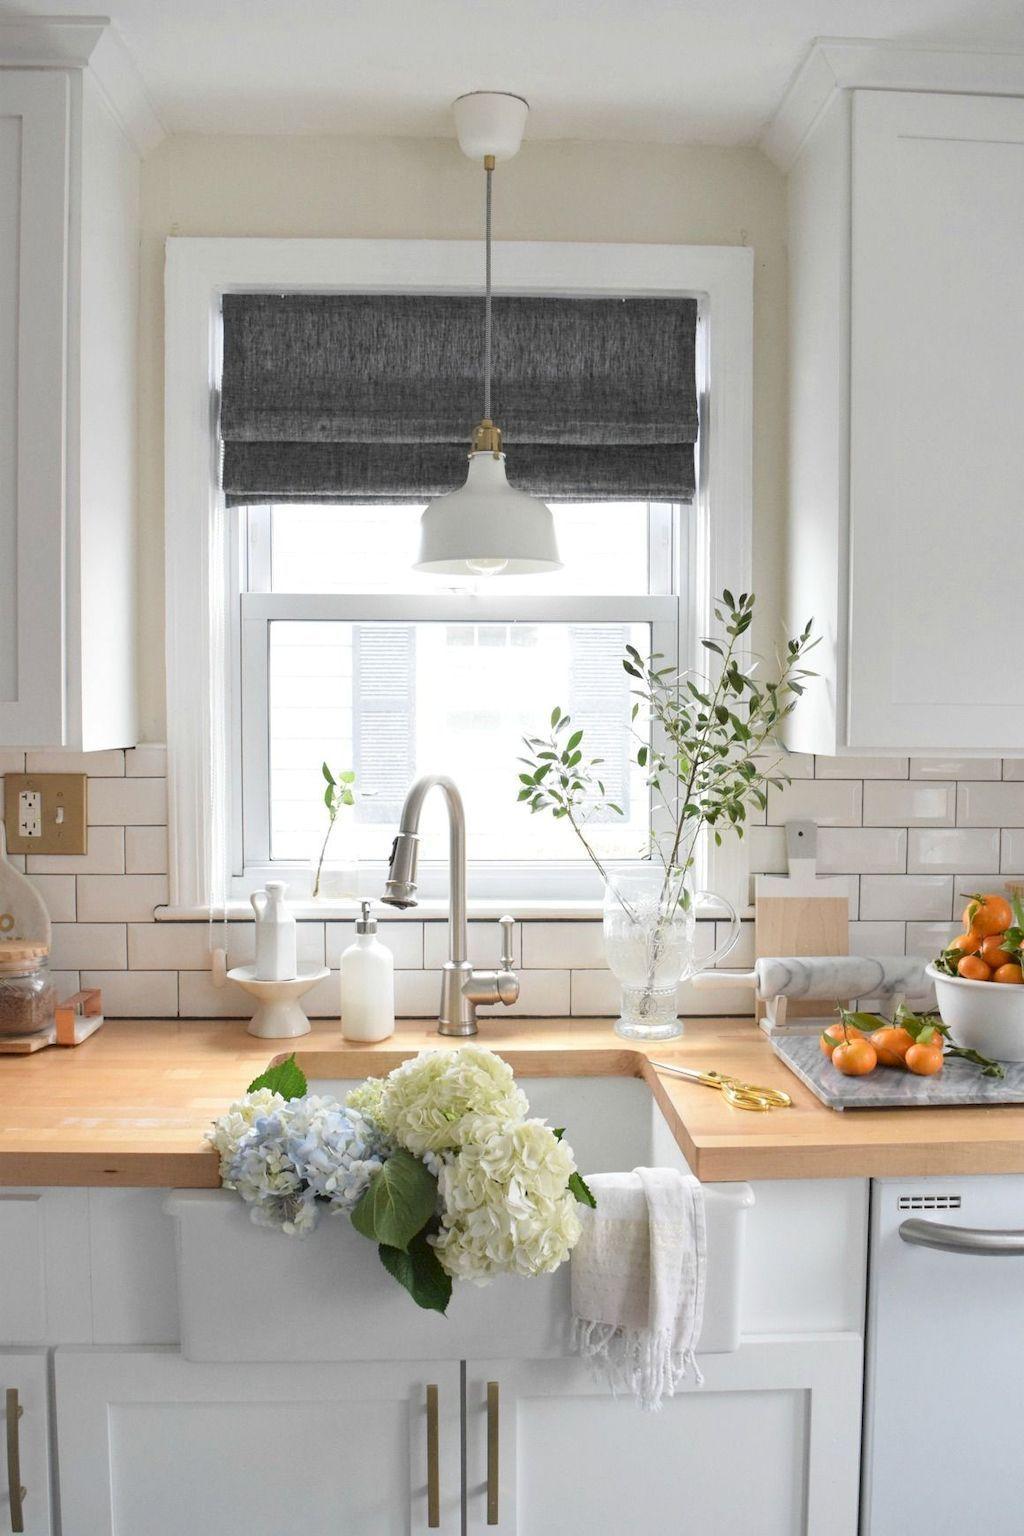 Kitchen Curtain Ideas Kitchen Curtain Design And Pattern In 2020